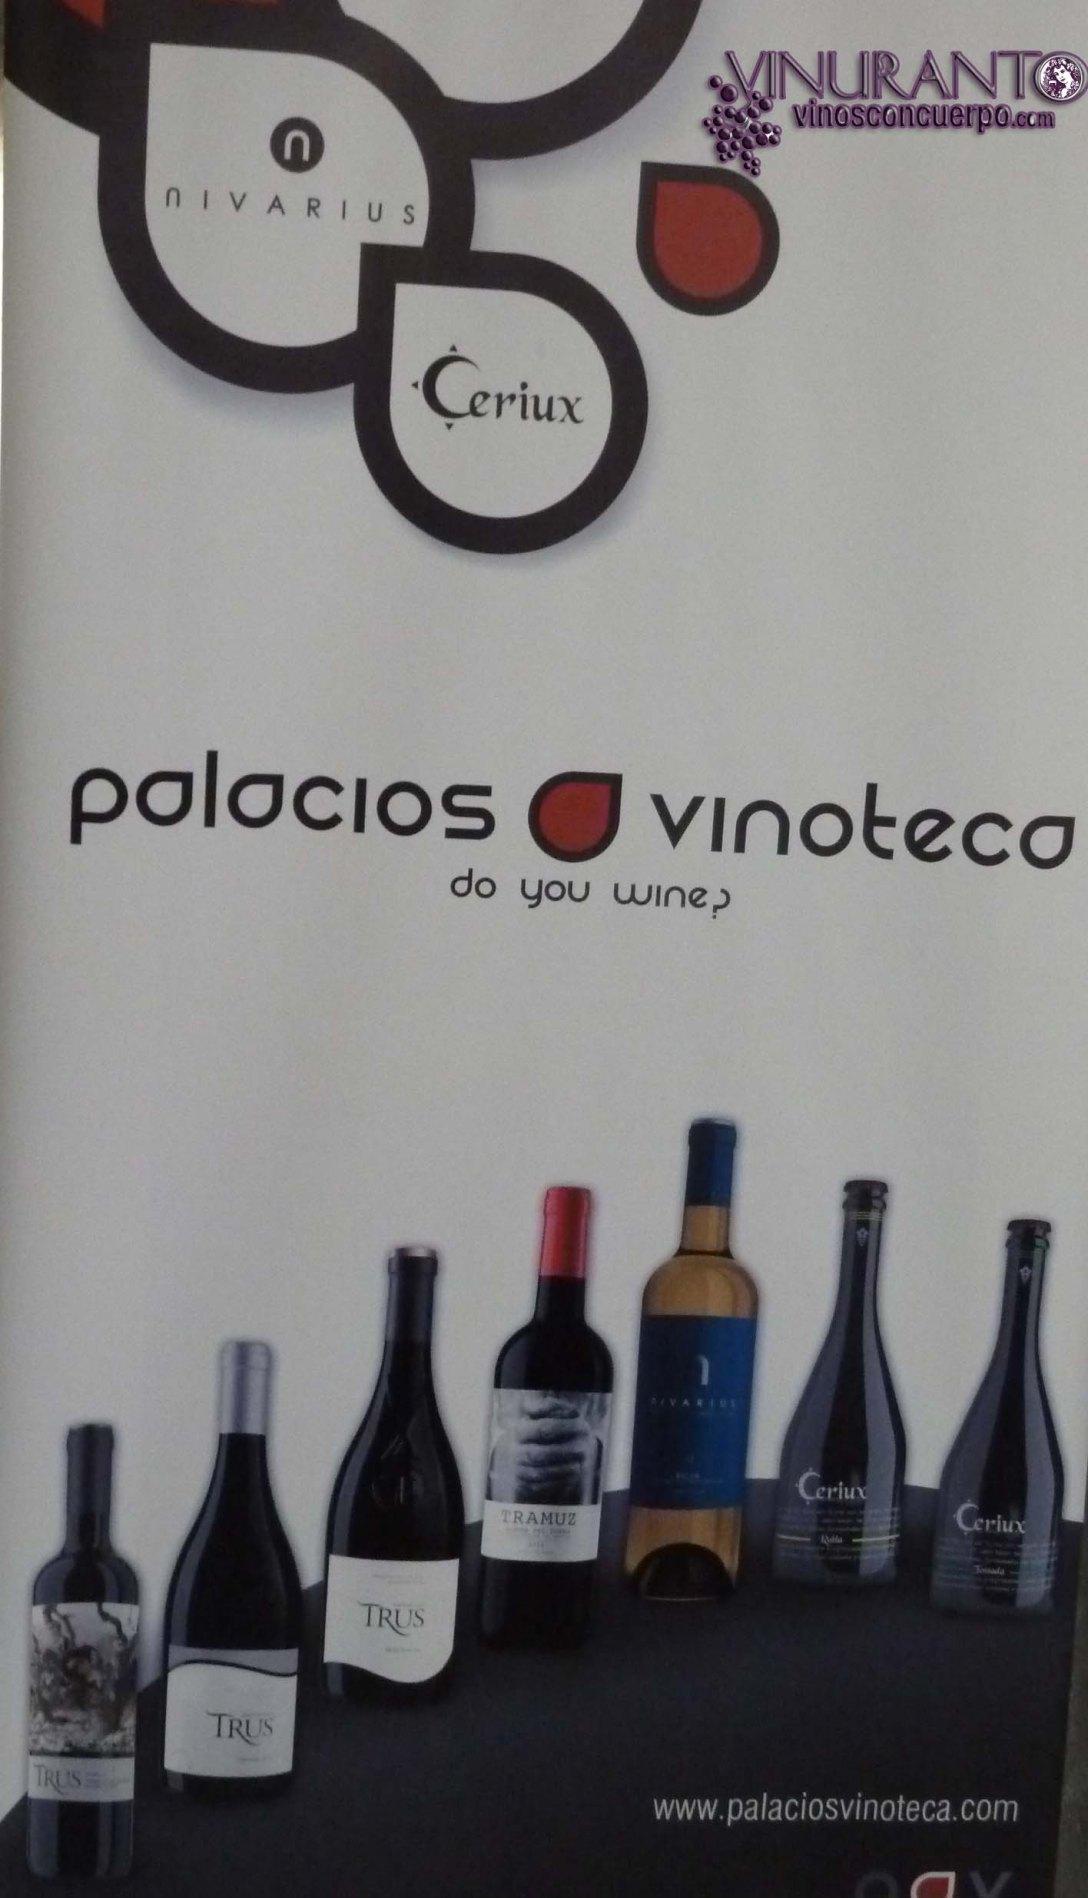 Grupo de empresas Palacios Vinoteca